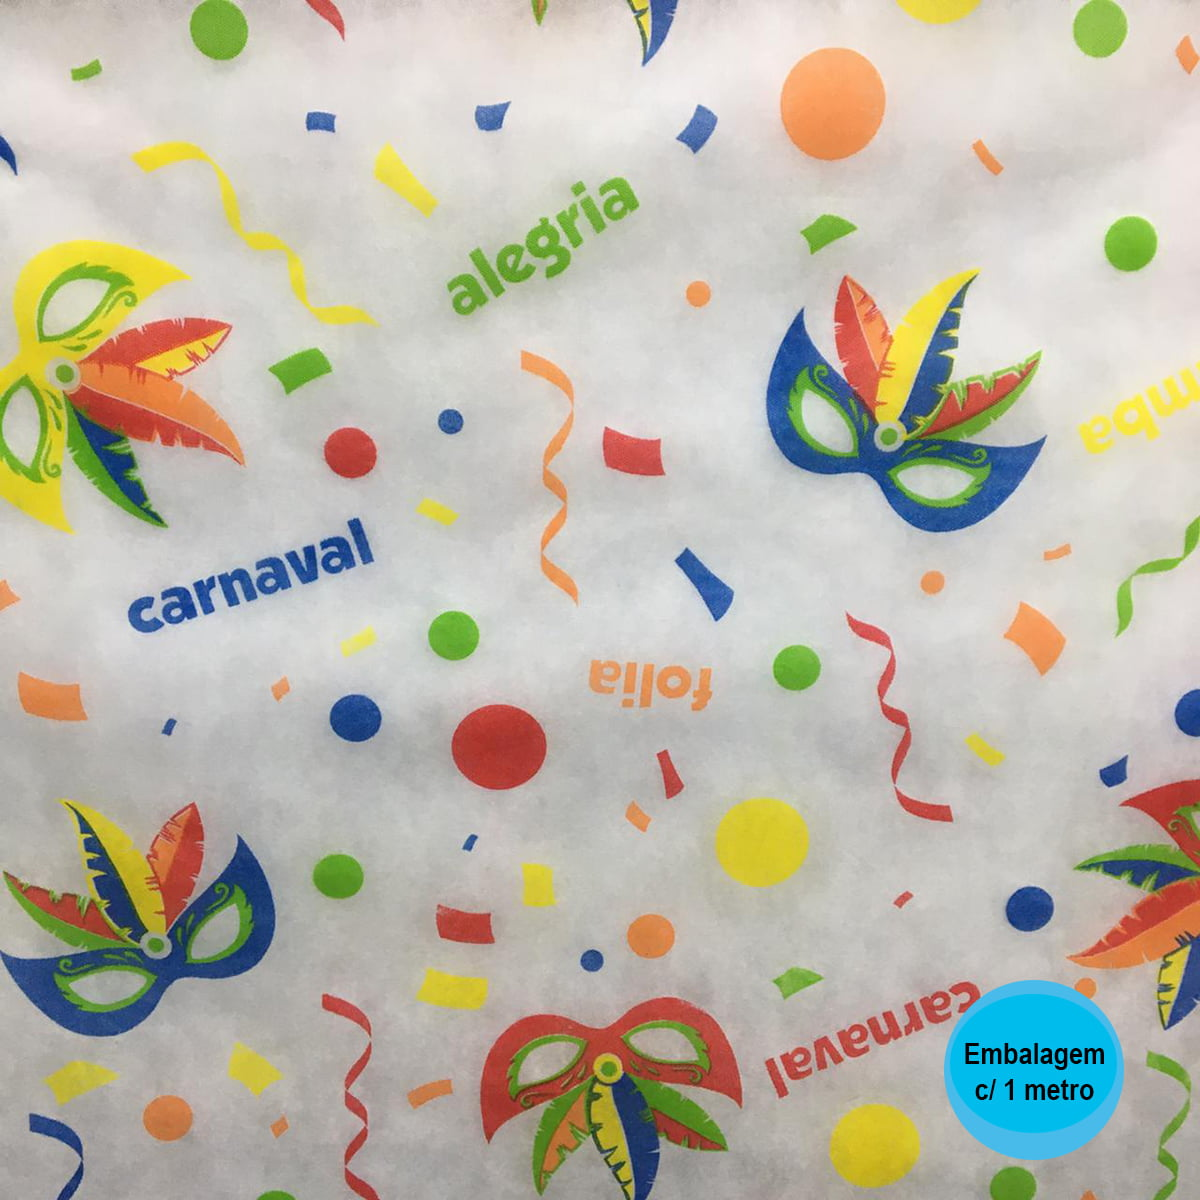 TNT Estampado Carnaval Alegria Folia - 1 metro